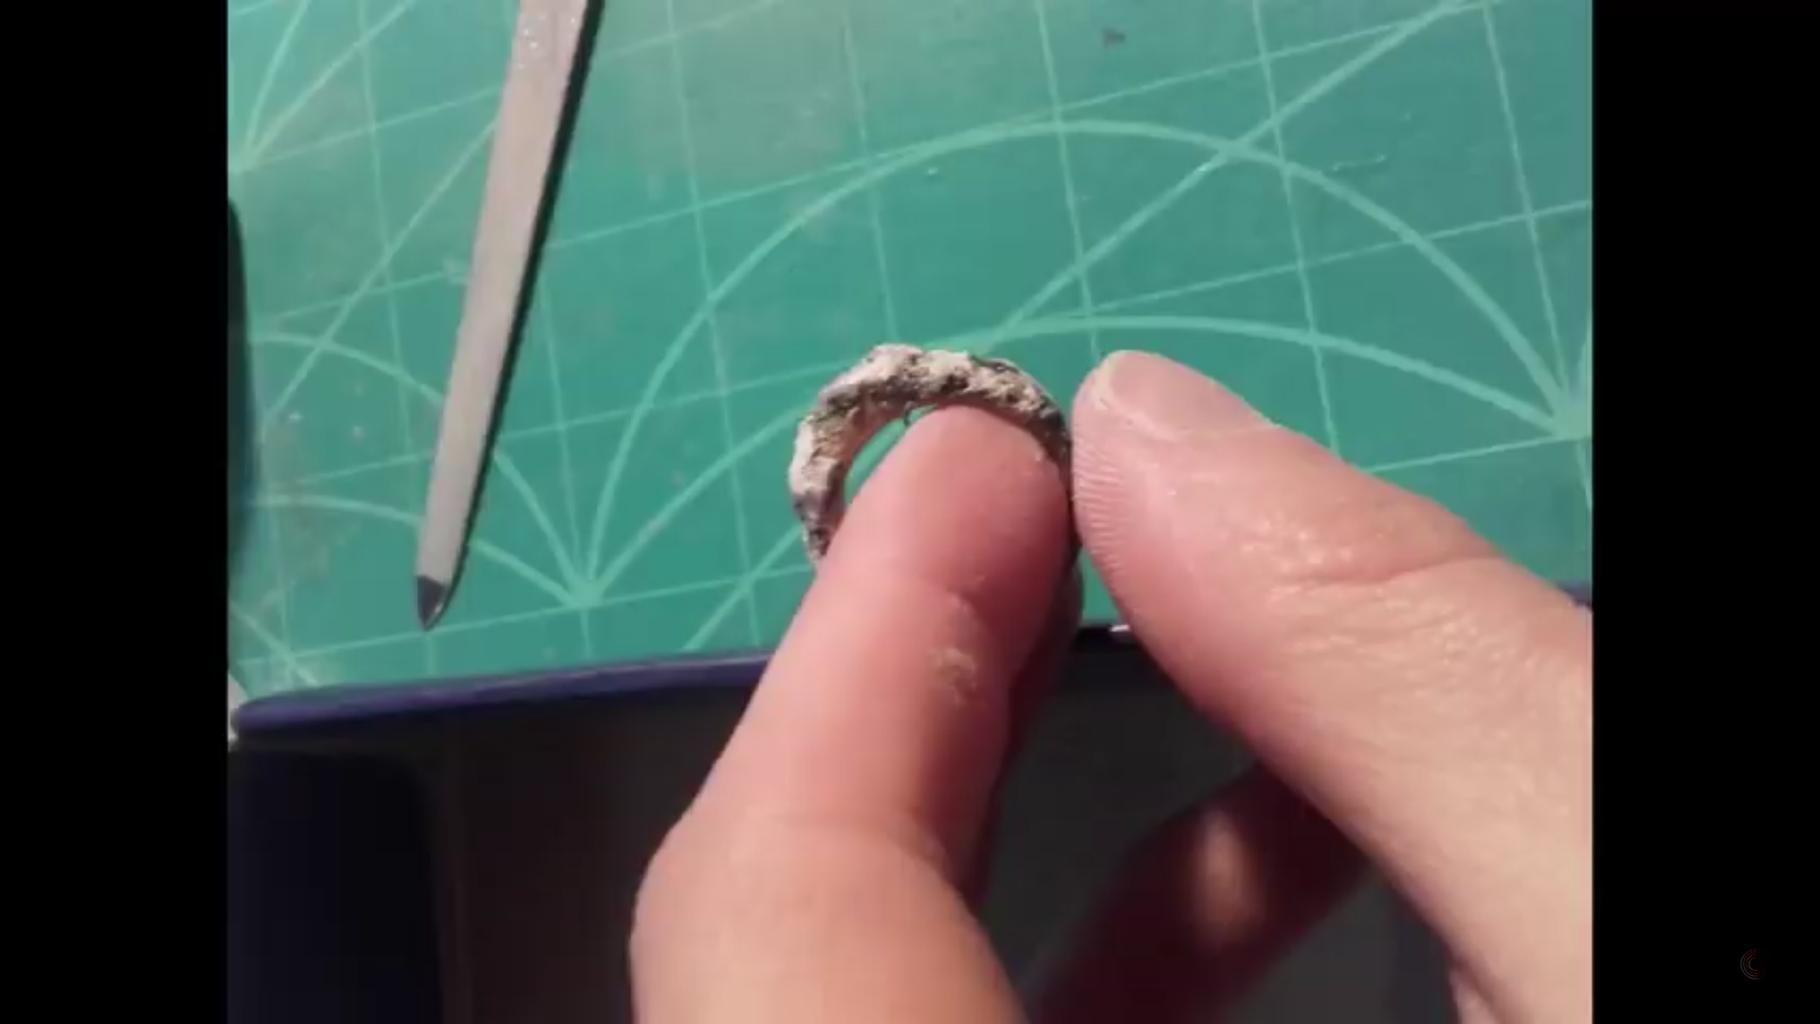 Glueing Stone Powder on That Thing